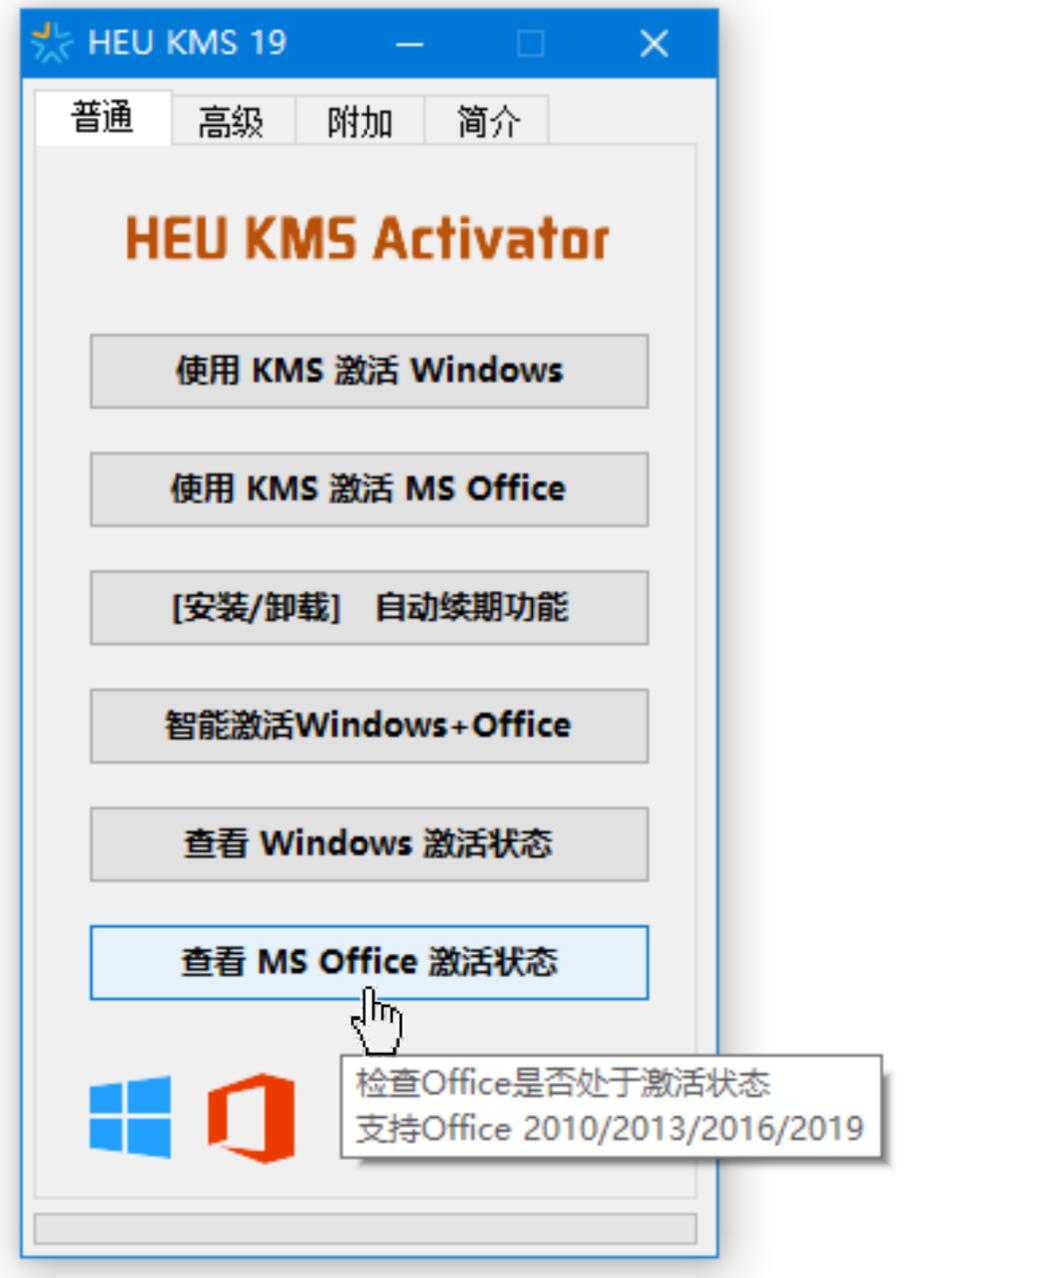 Windows+Office全版本激活器下载-HEU KMS Activator v19.6.0